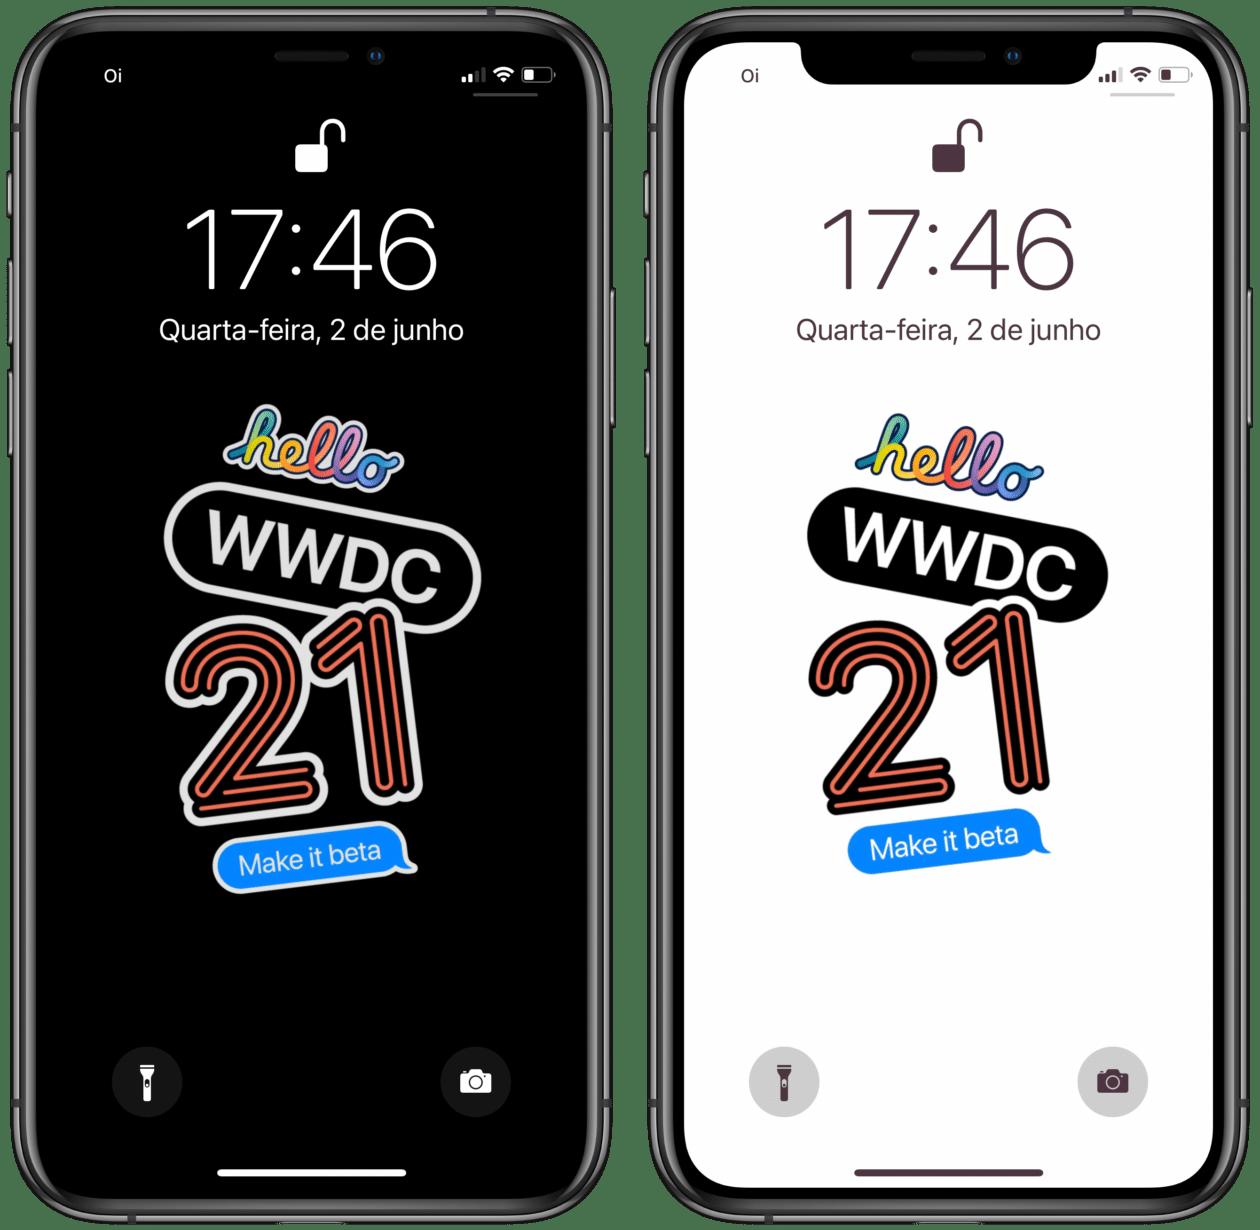 Wallpapers WWDC21